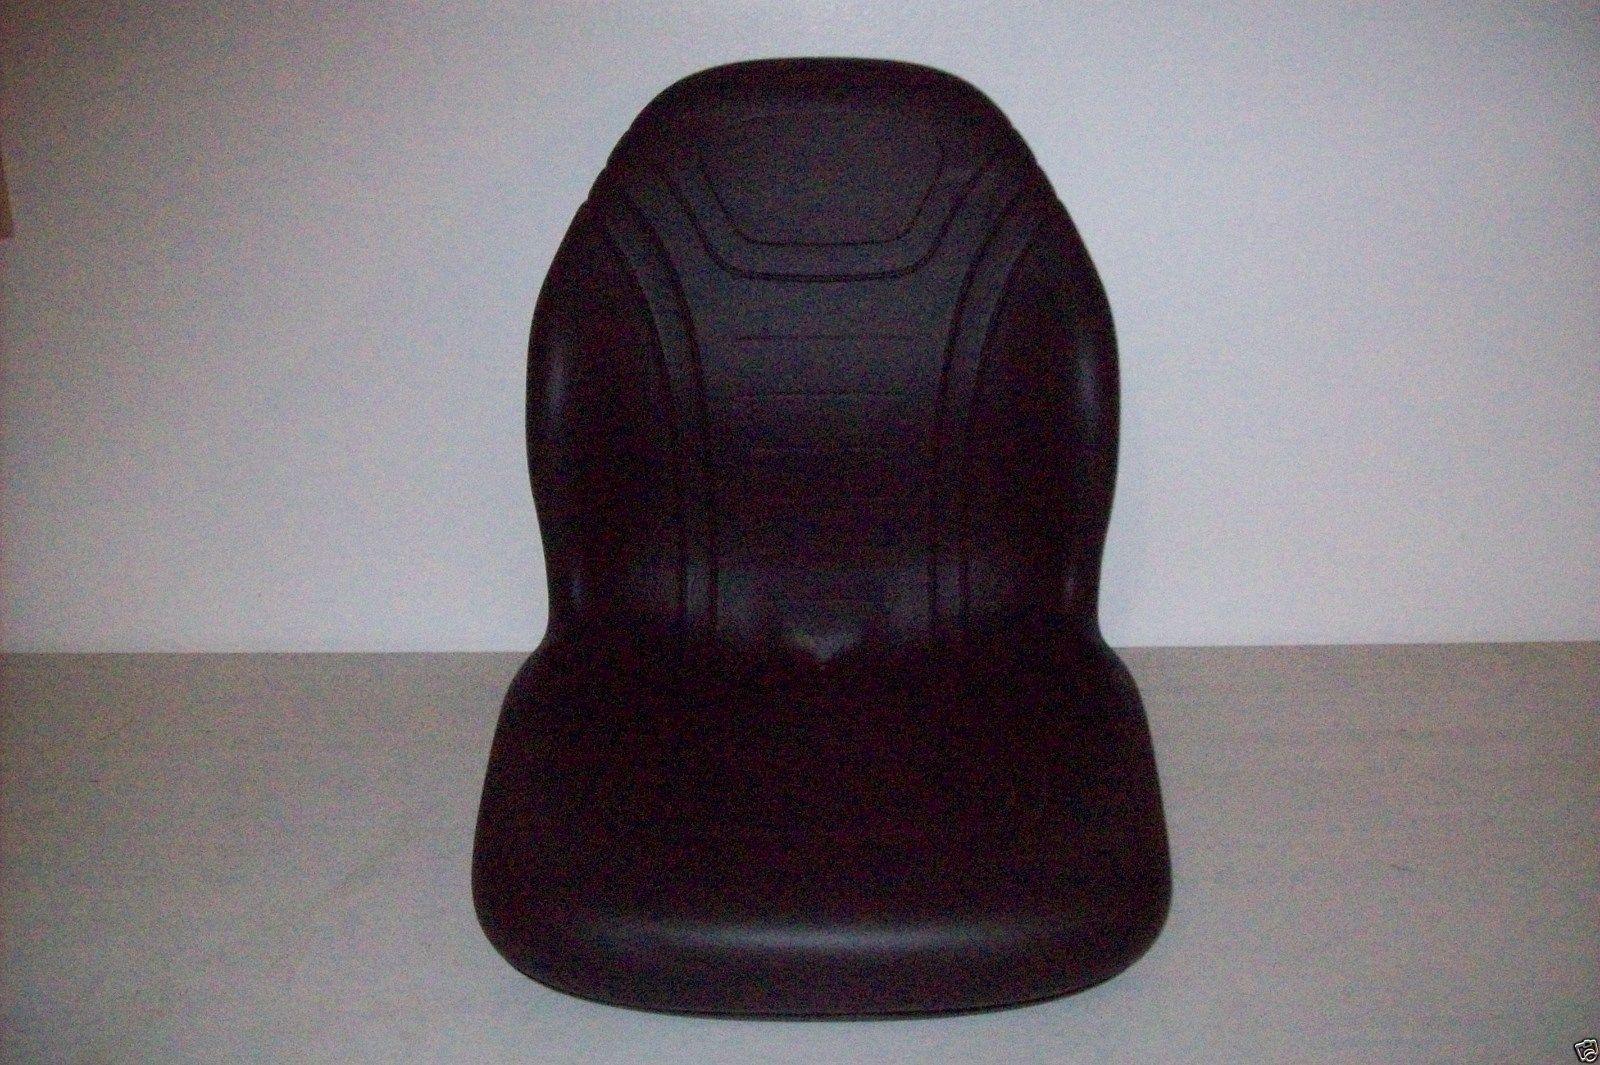 642 Bobcat Wiring Diagram Harness Adapter High Back Black Seat 463 542 543 643 742 743 843 873